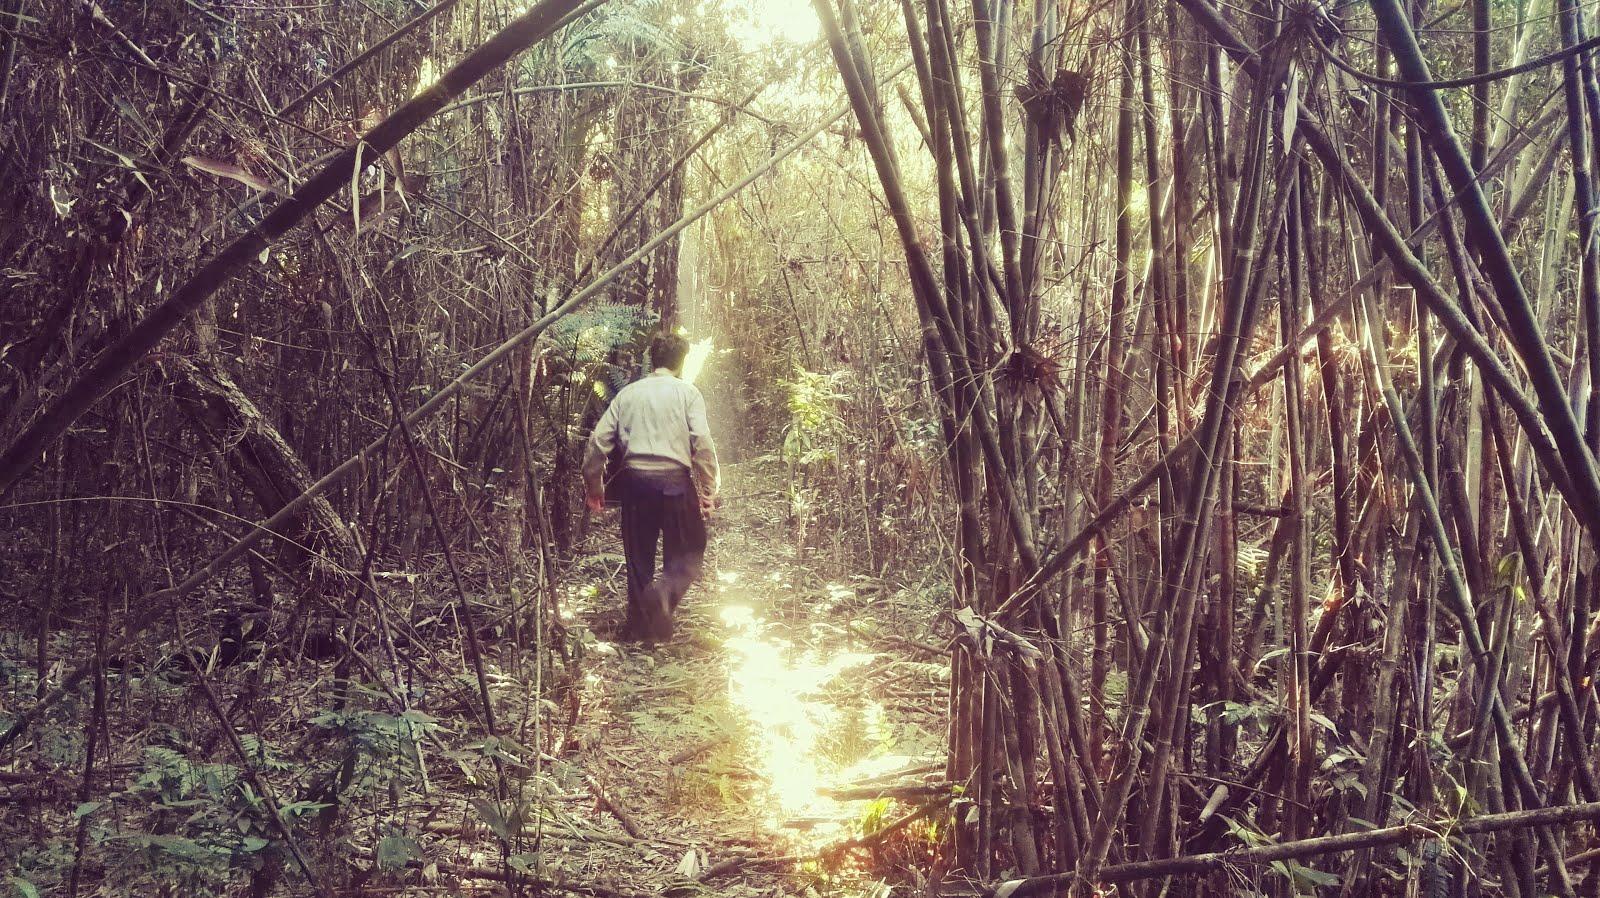 La Perla de la Selva Ecolodge